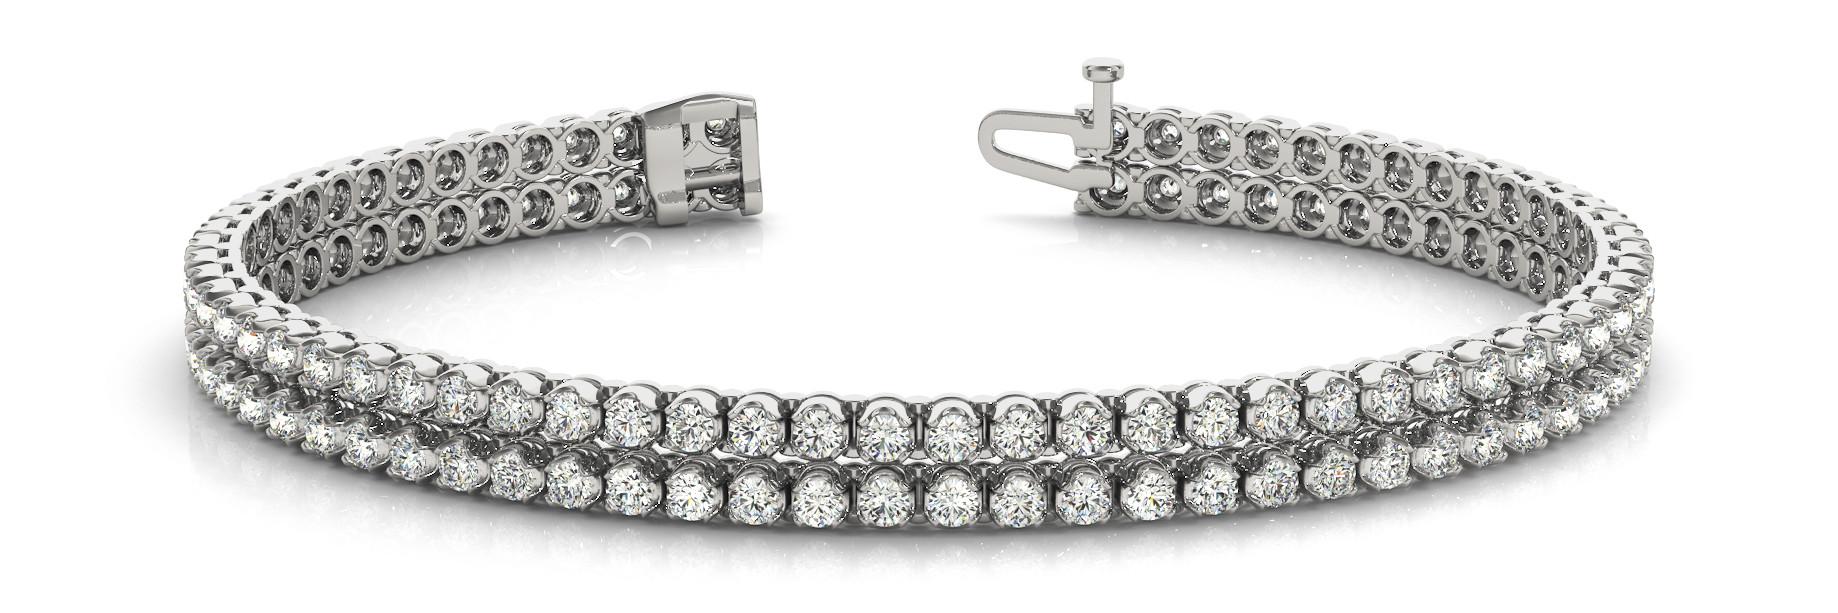 Bracelet In Line Multi Row